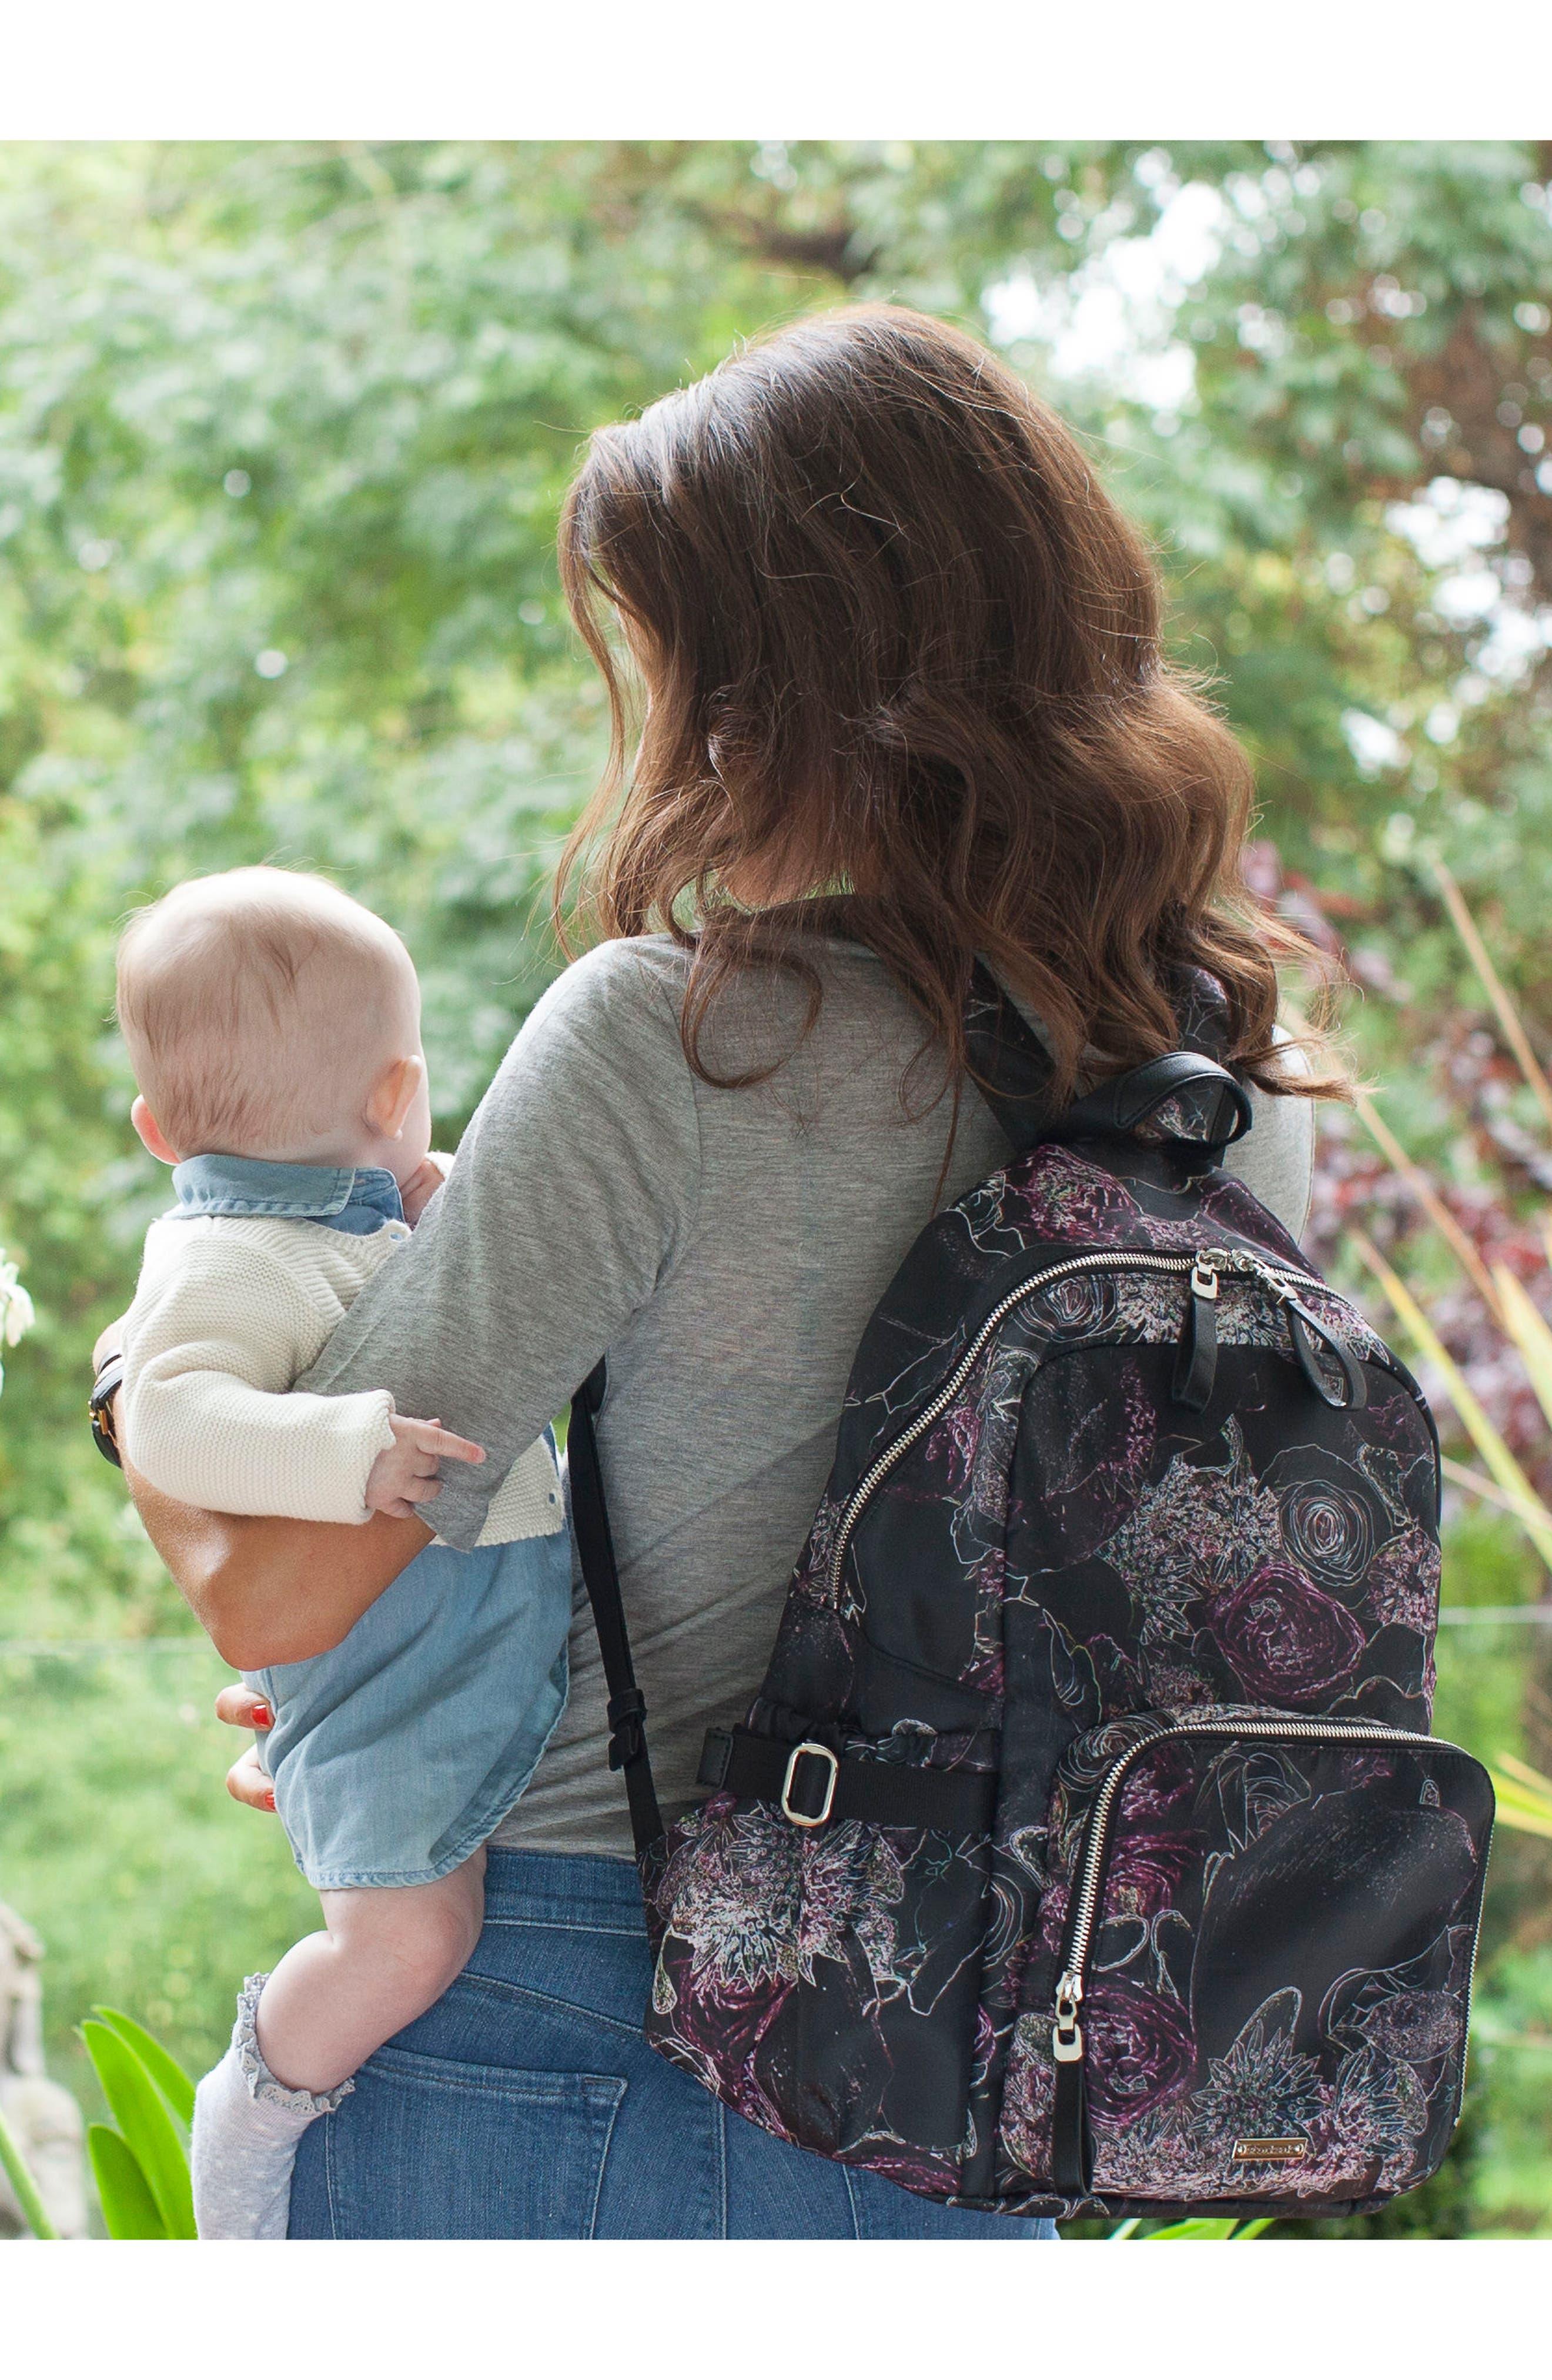 Hero Water Resistant Nylon Backpack Diaper Bag,                             Alternate thumbnail 10, color,                             Neon Floral